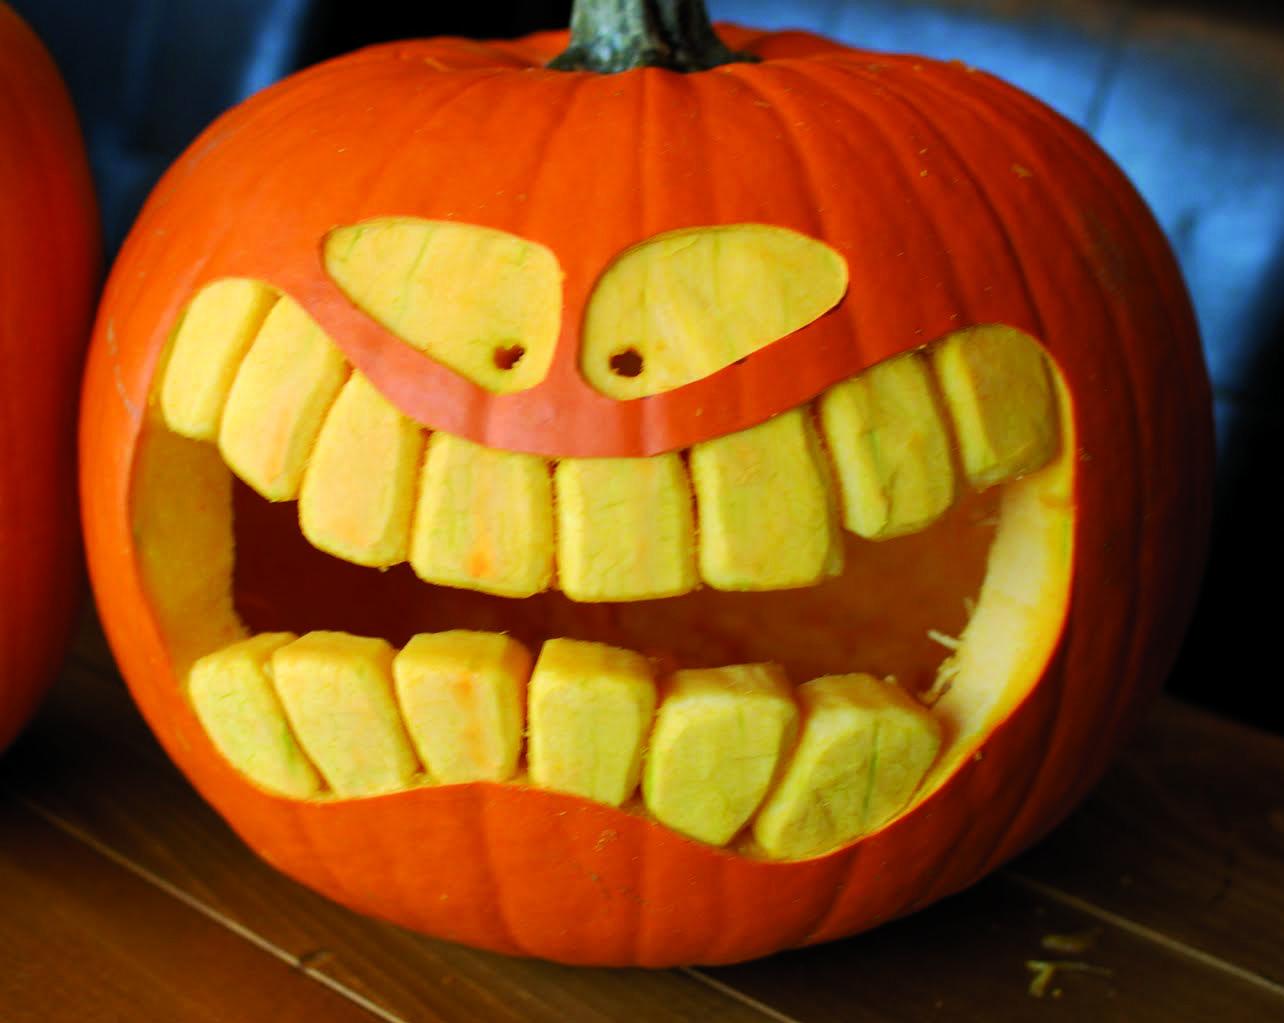 Pumpkin food waste